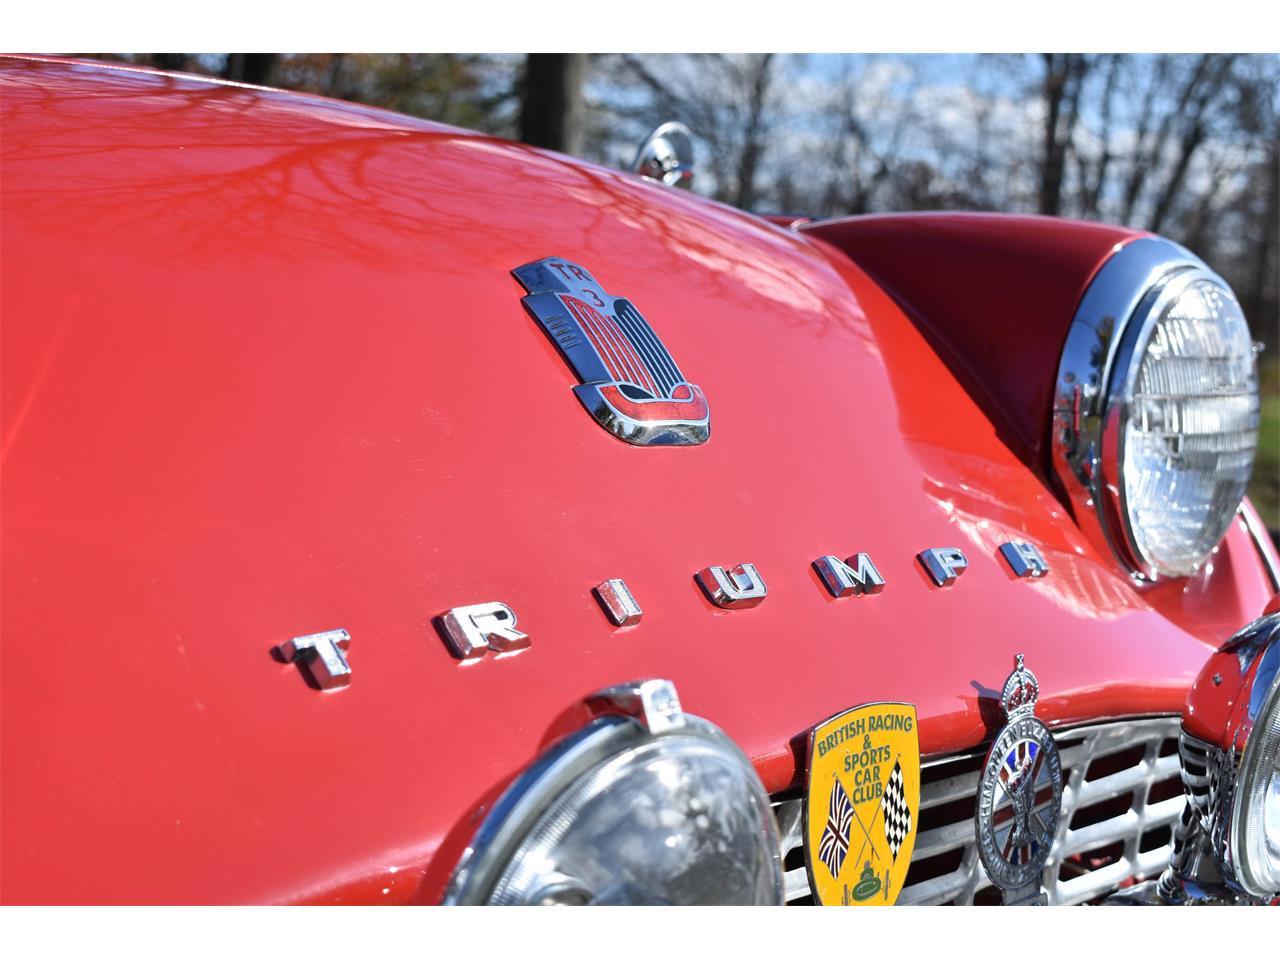 1959 Triumph TR3A (CC-1296632) for sale in Orange, Connecticut